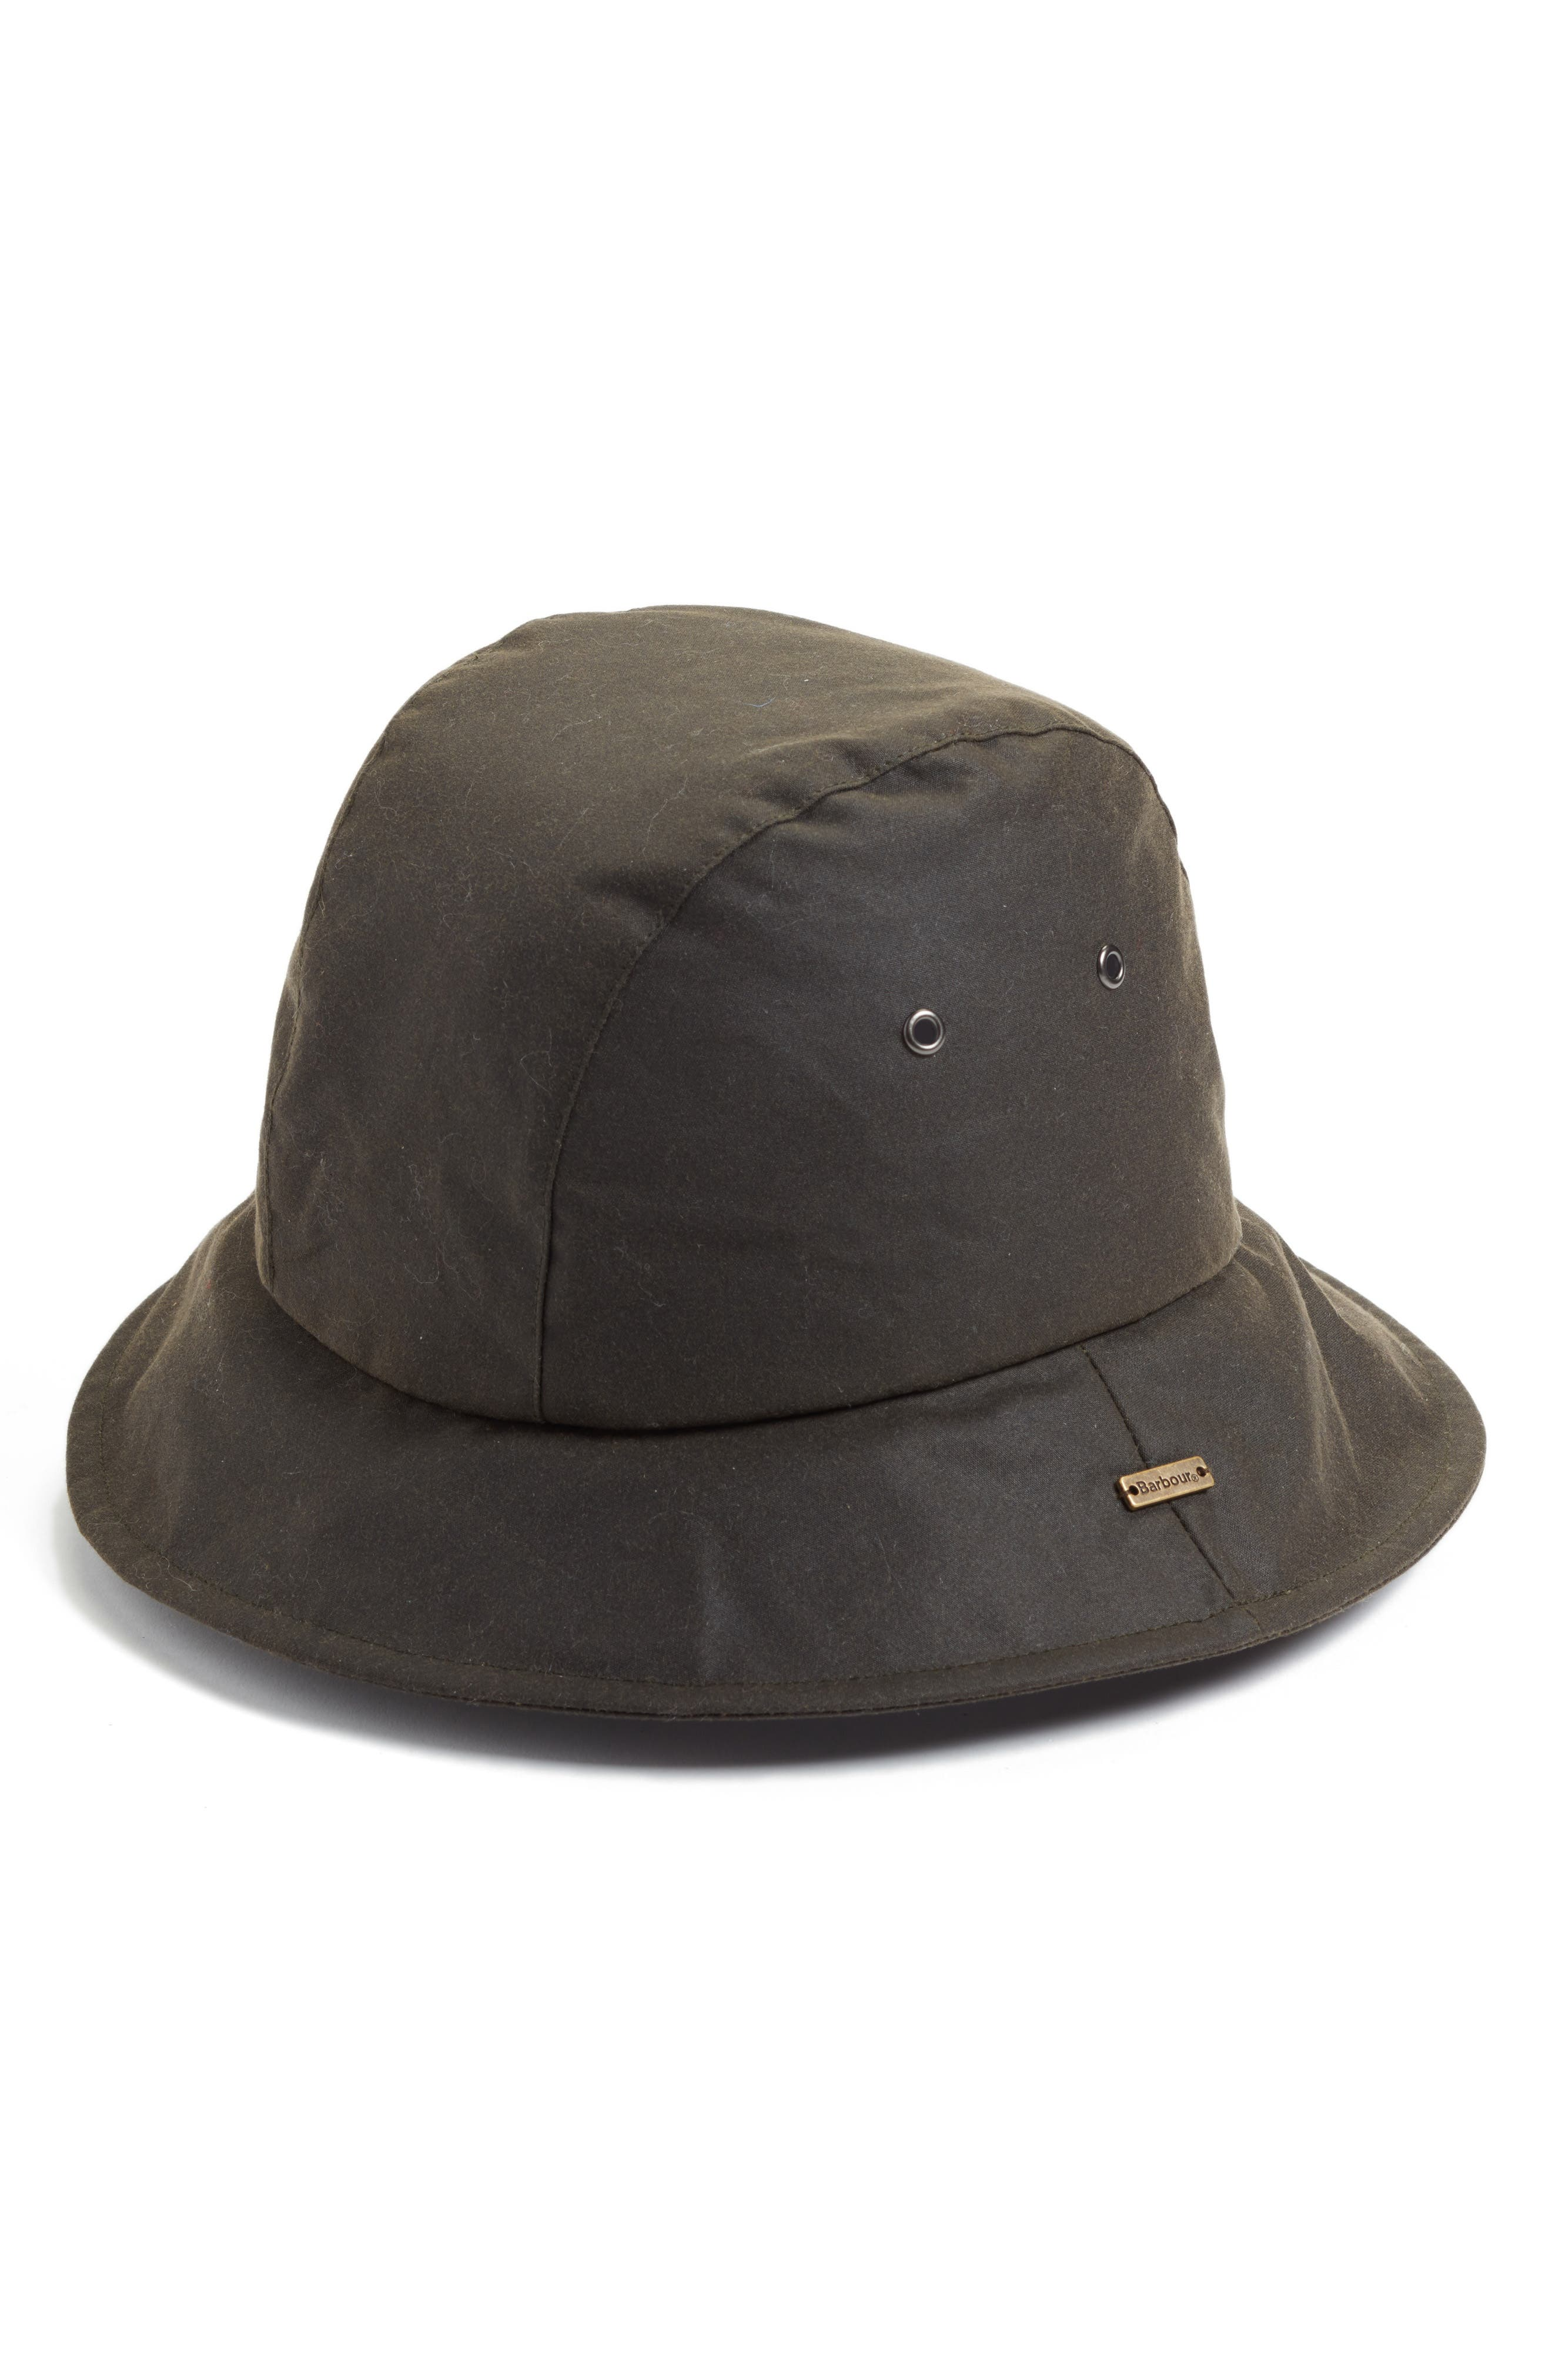 Main Image - Barbou Sou Wester Bucket Hat